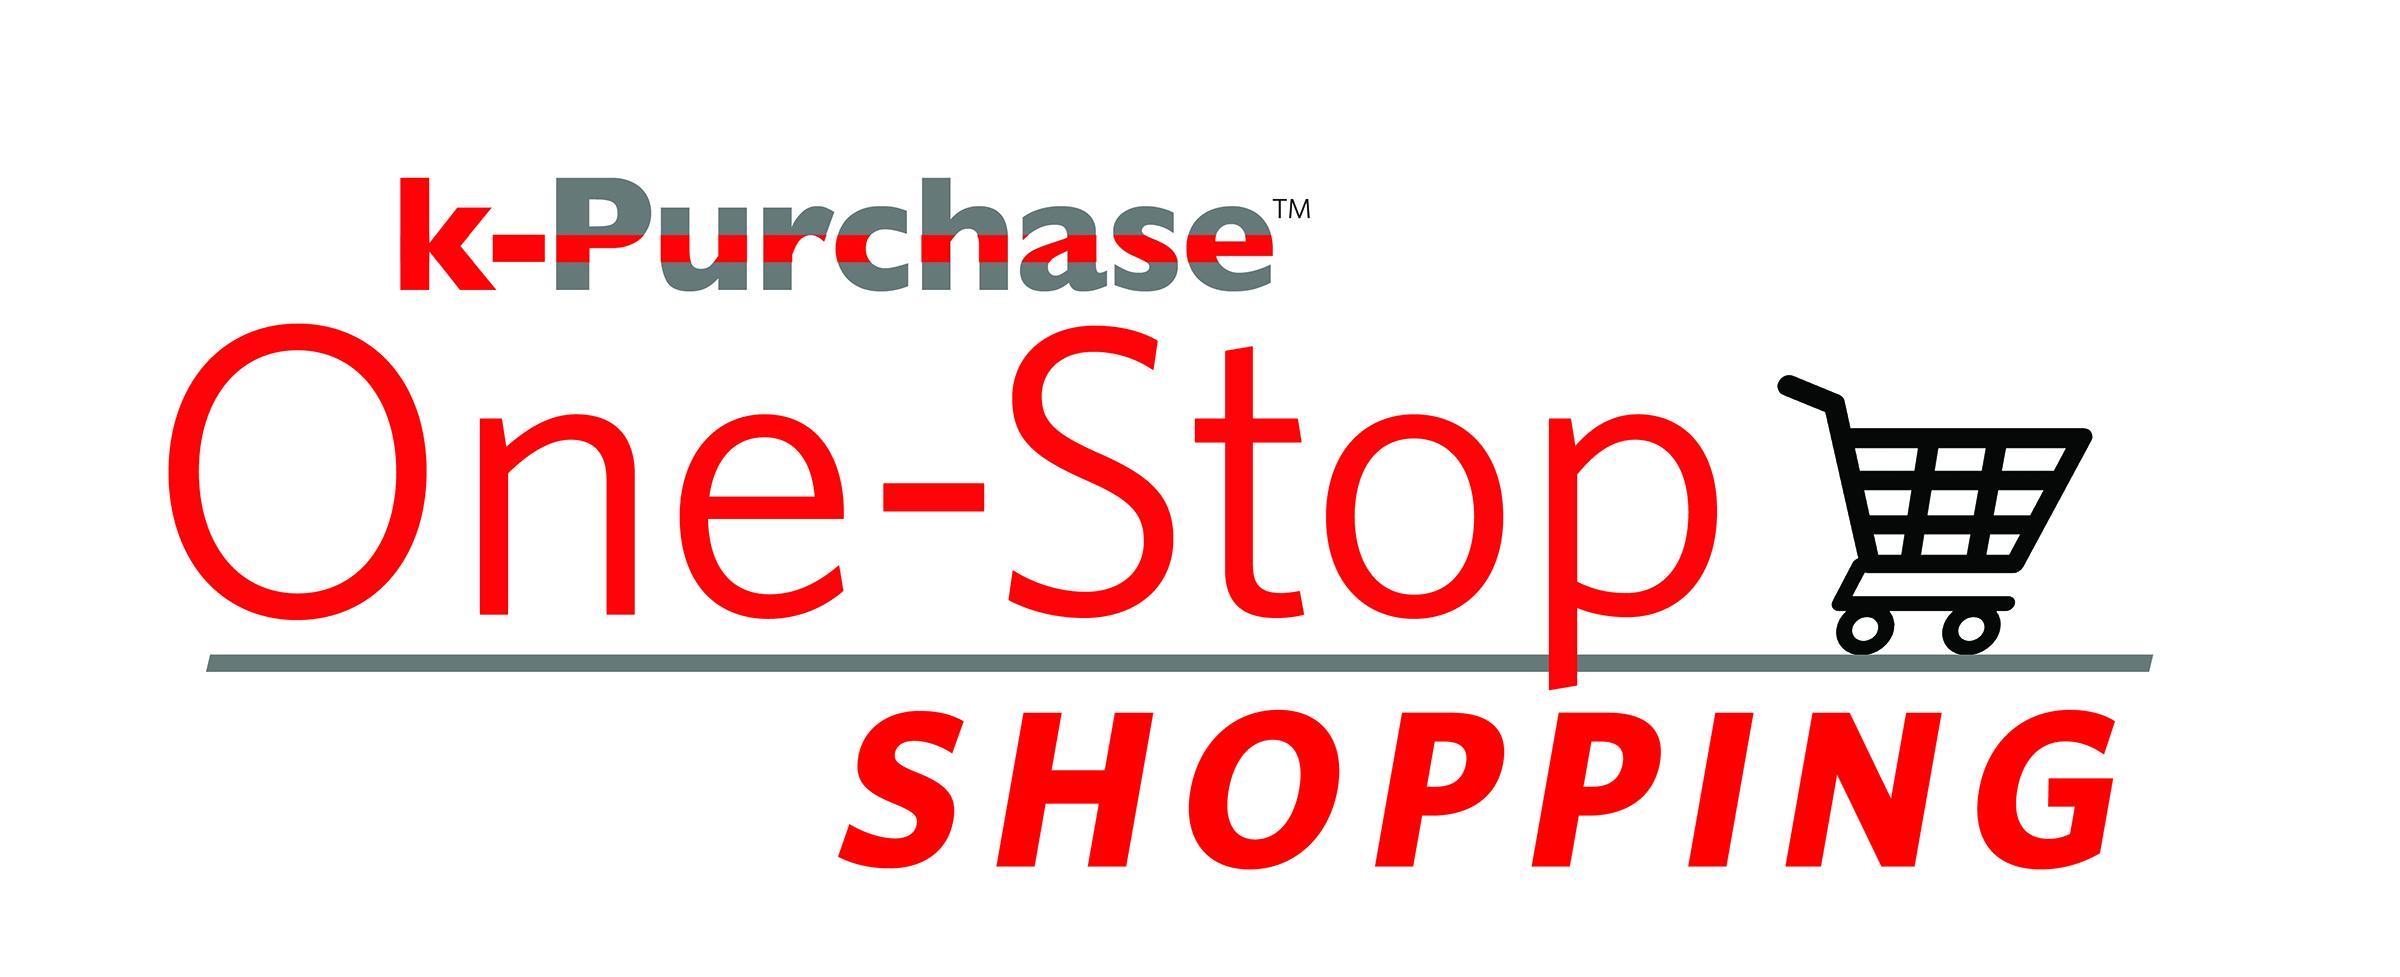 One-Stop Shopping logo.jpg